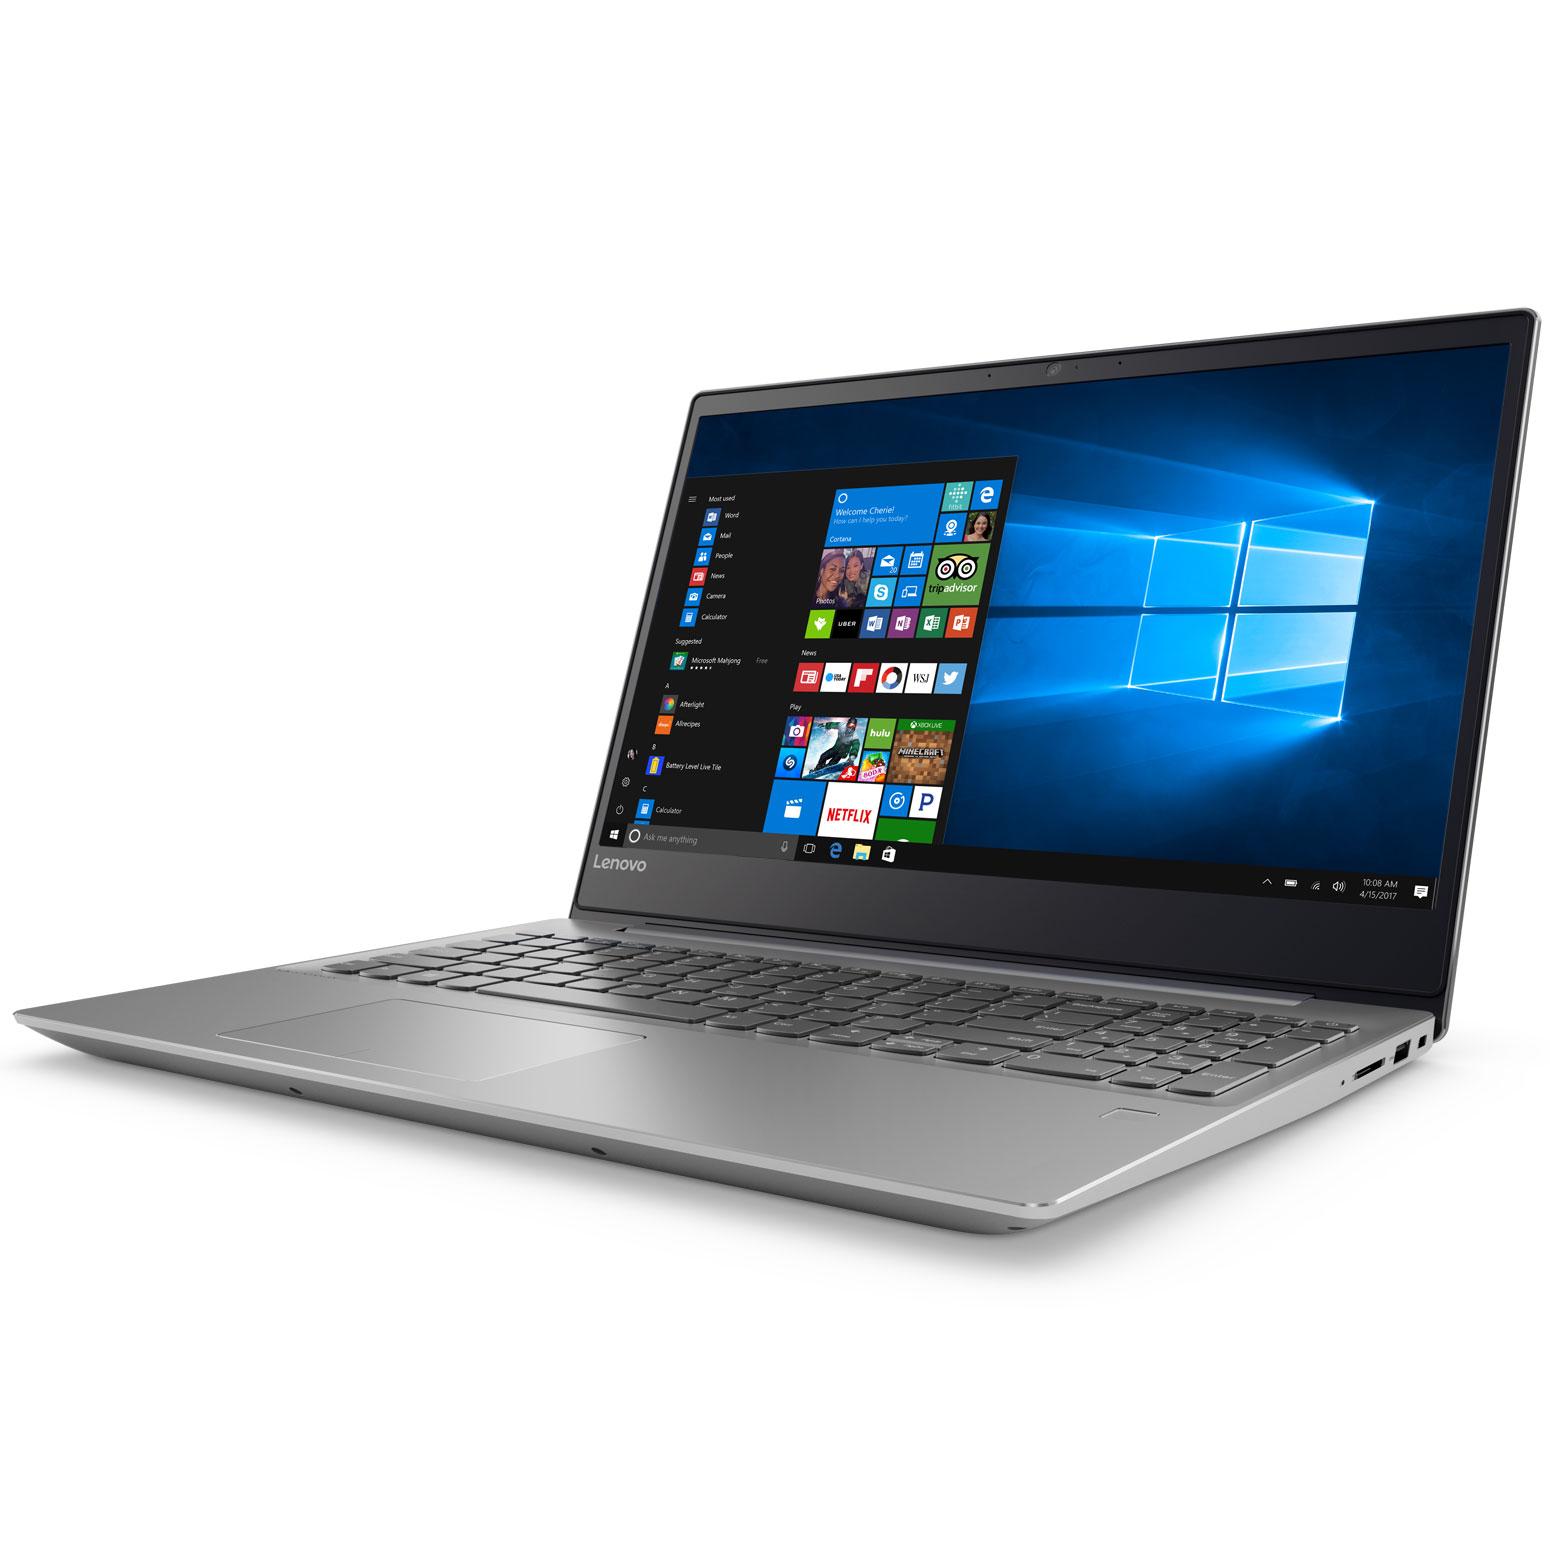 "PC portable Lenovo IdeaPad 720-15IKBR (81C70019FR) Intel Core i5-8250U 4 Go 1 To 15.6"" LED Full HD AMD Radeon RX 550 2 Go Wi-Fi AC/Bluetooth Webcam Windows 10 Famille 64 bits"